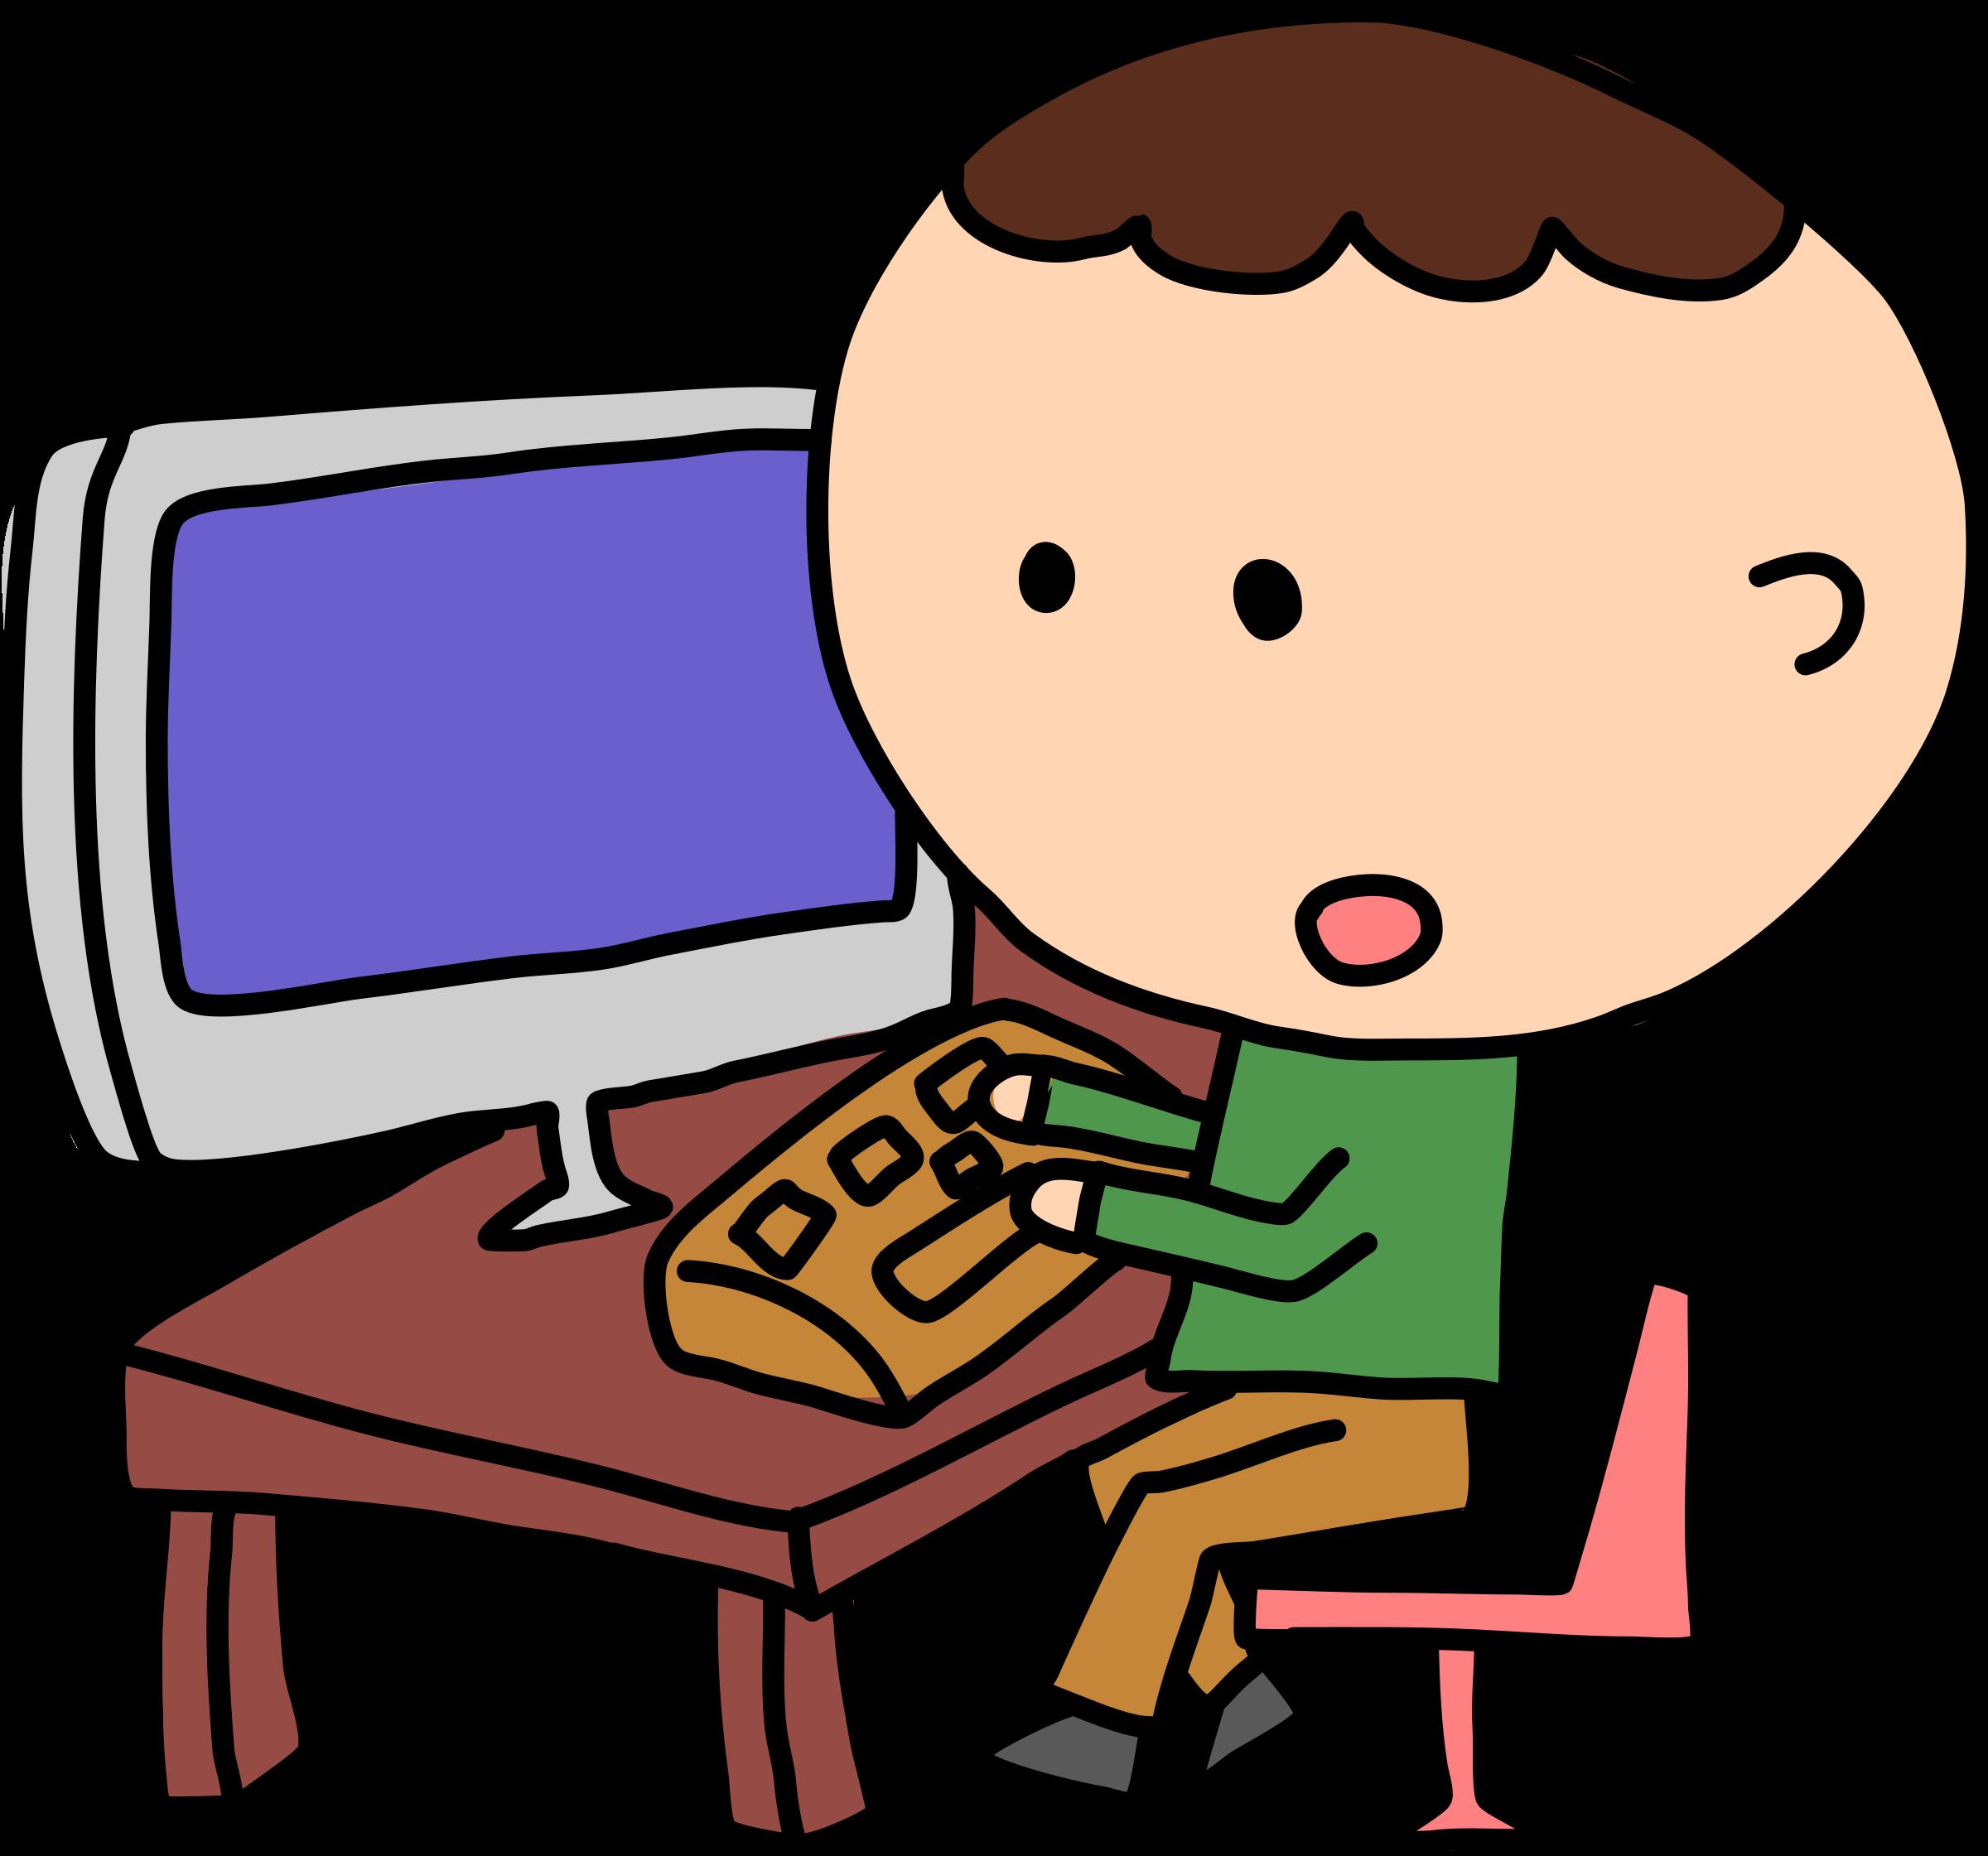 Man vs computer clipart download Man and computer clipart - ClipartFest download